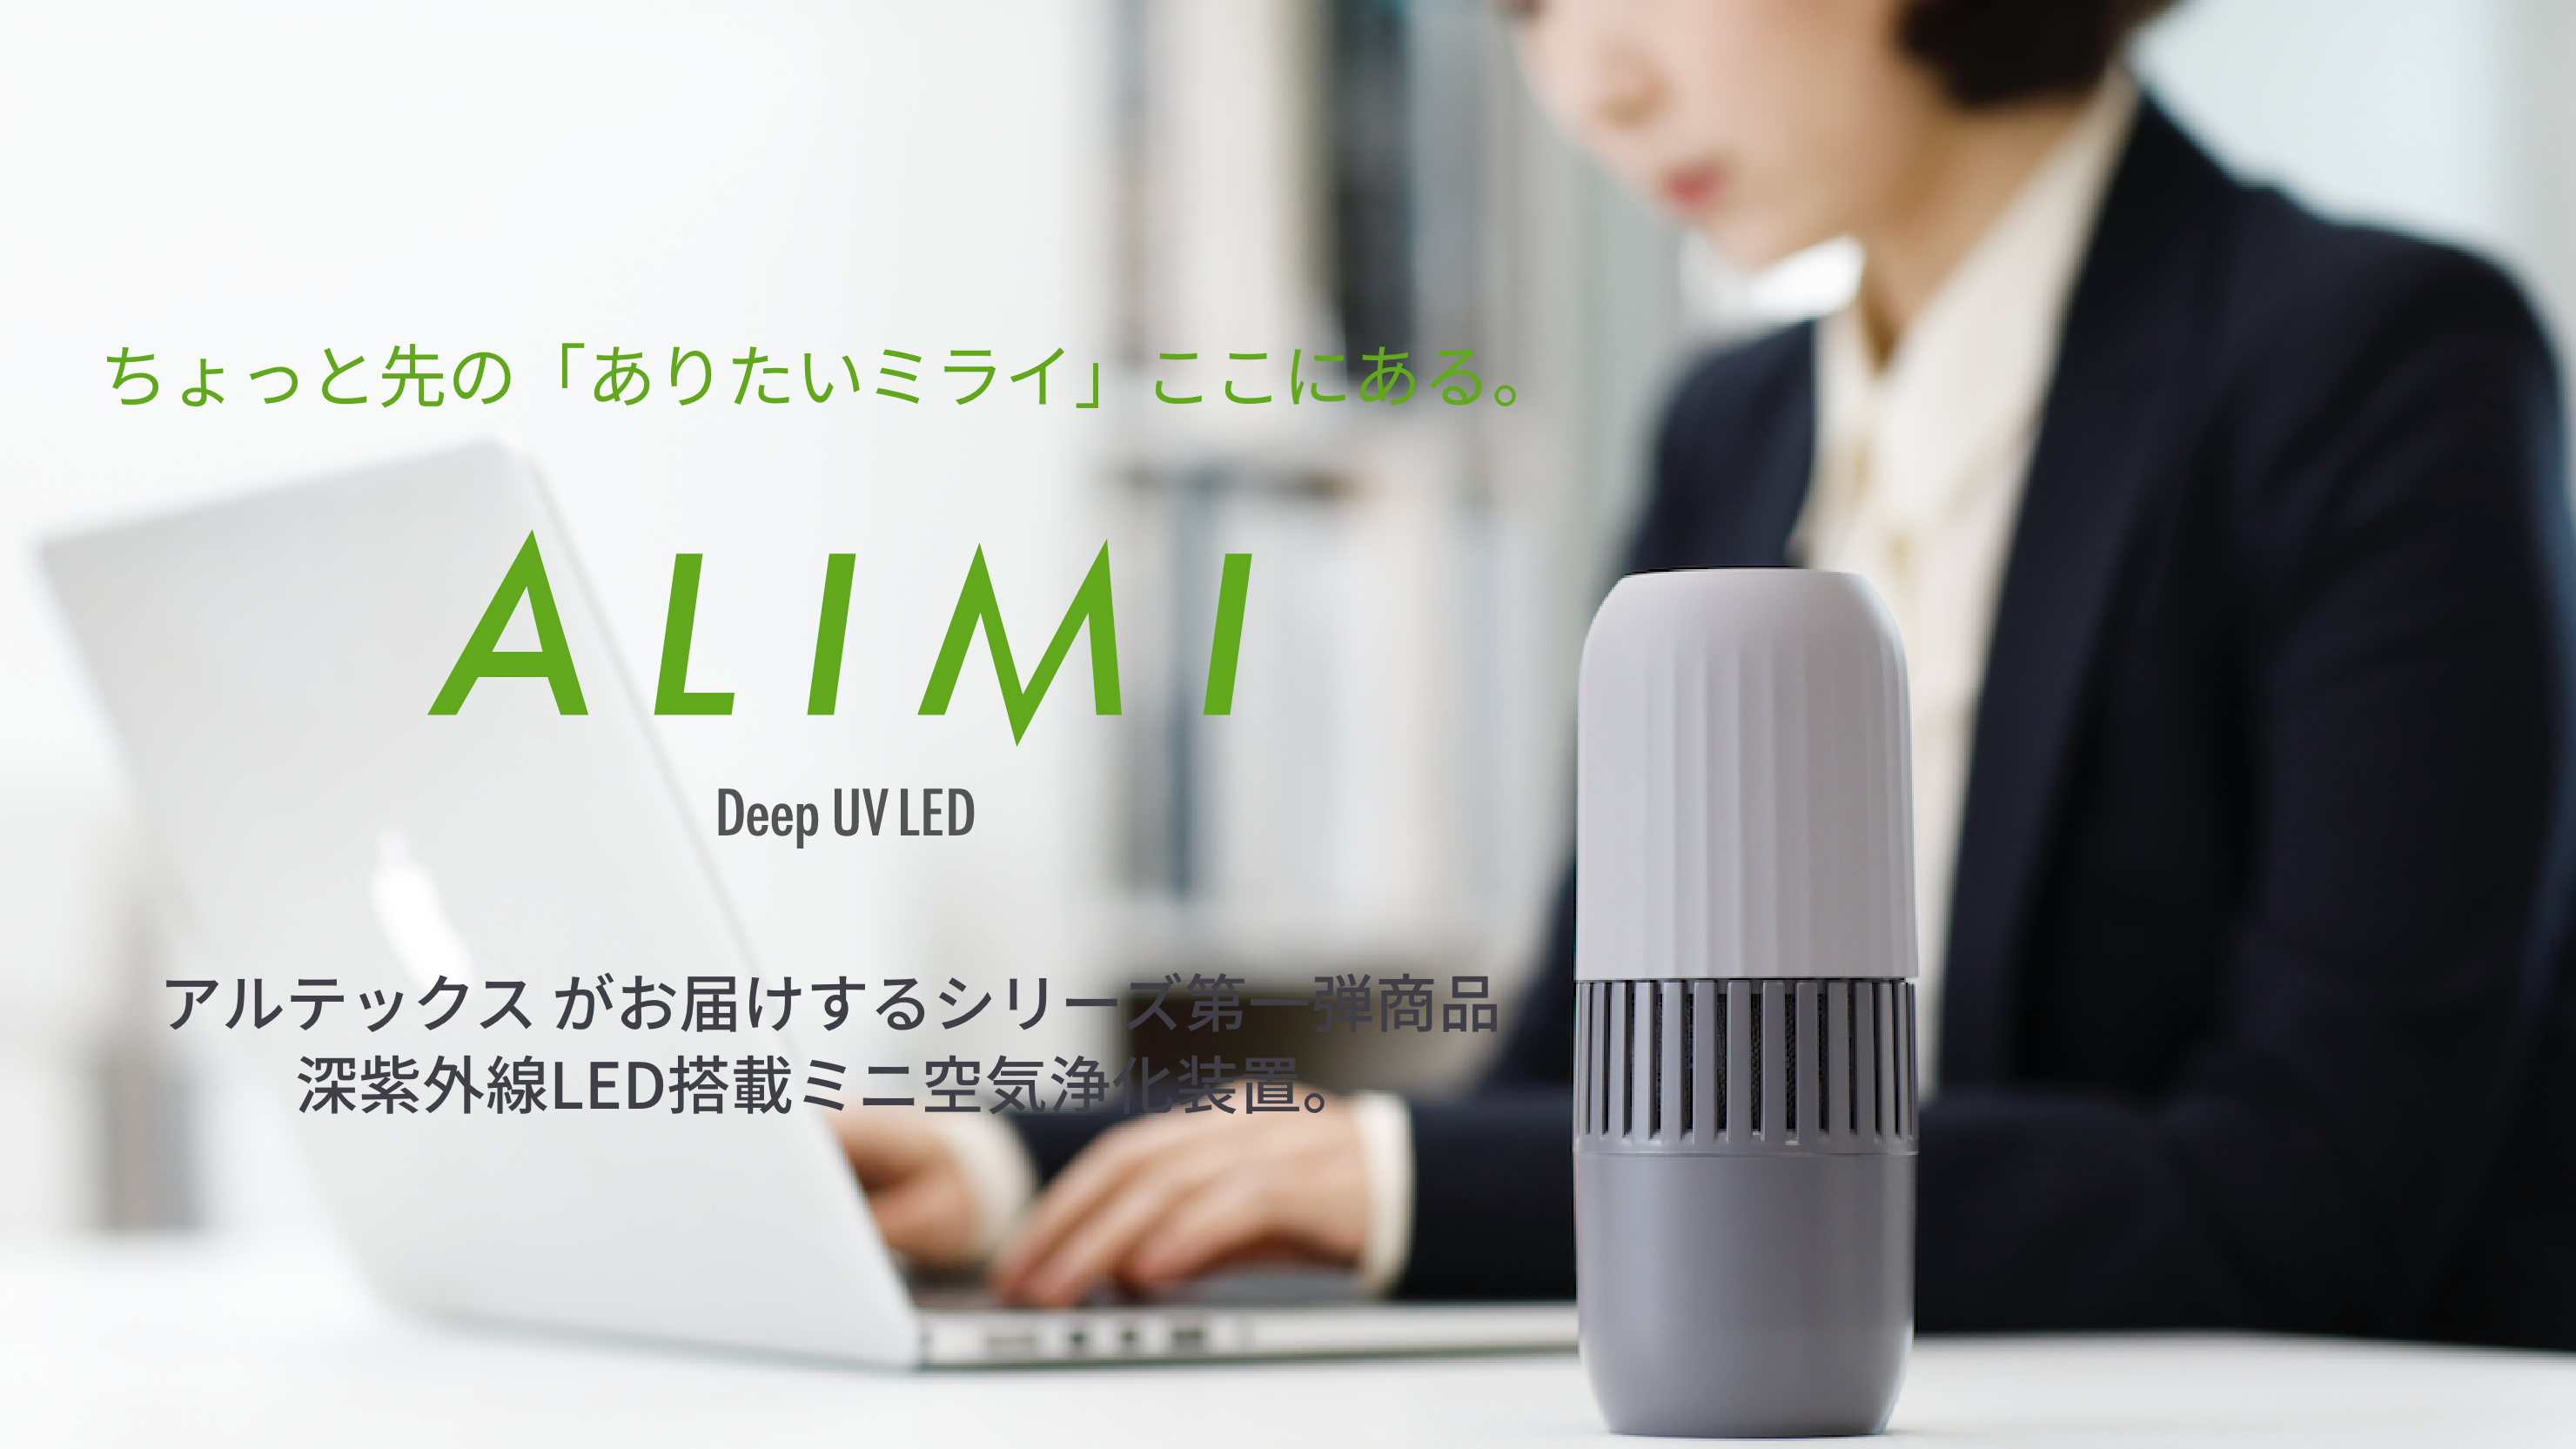 alimi メイン-1